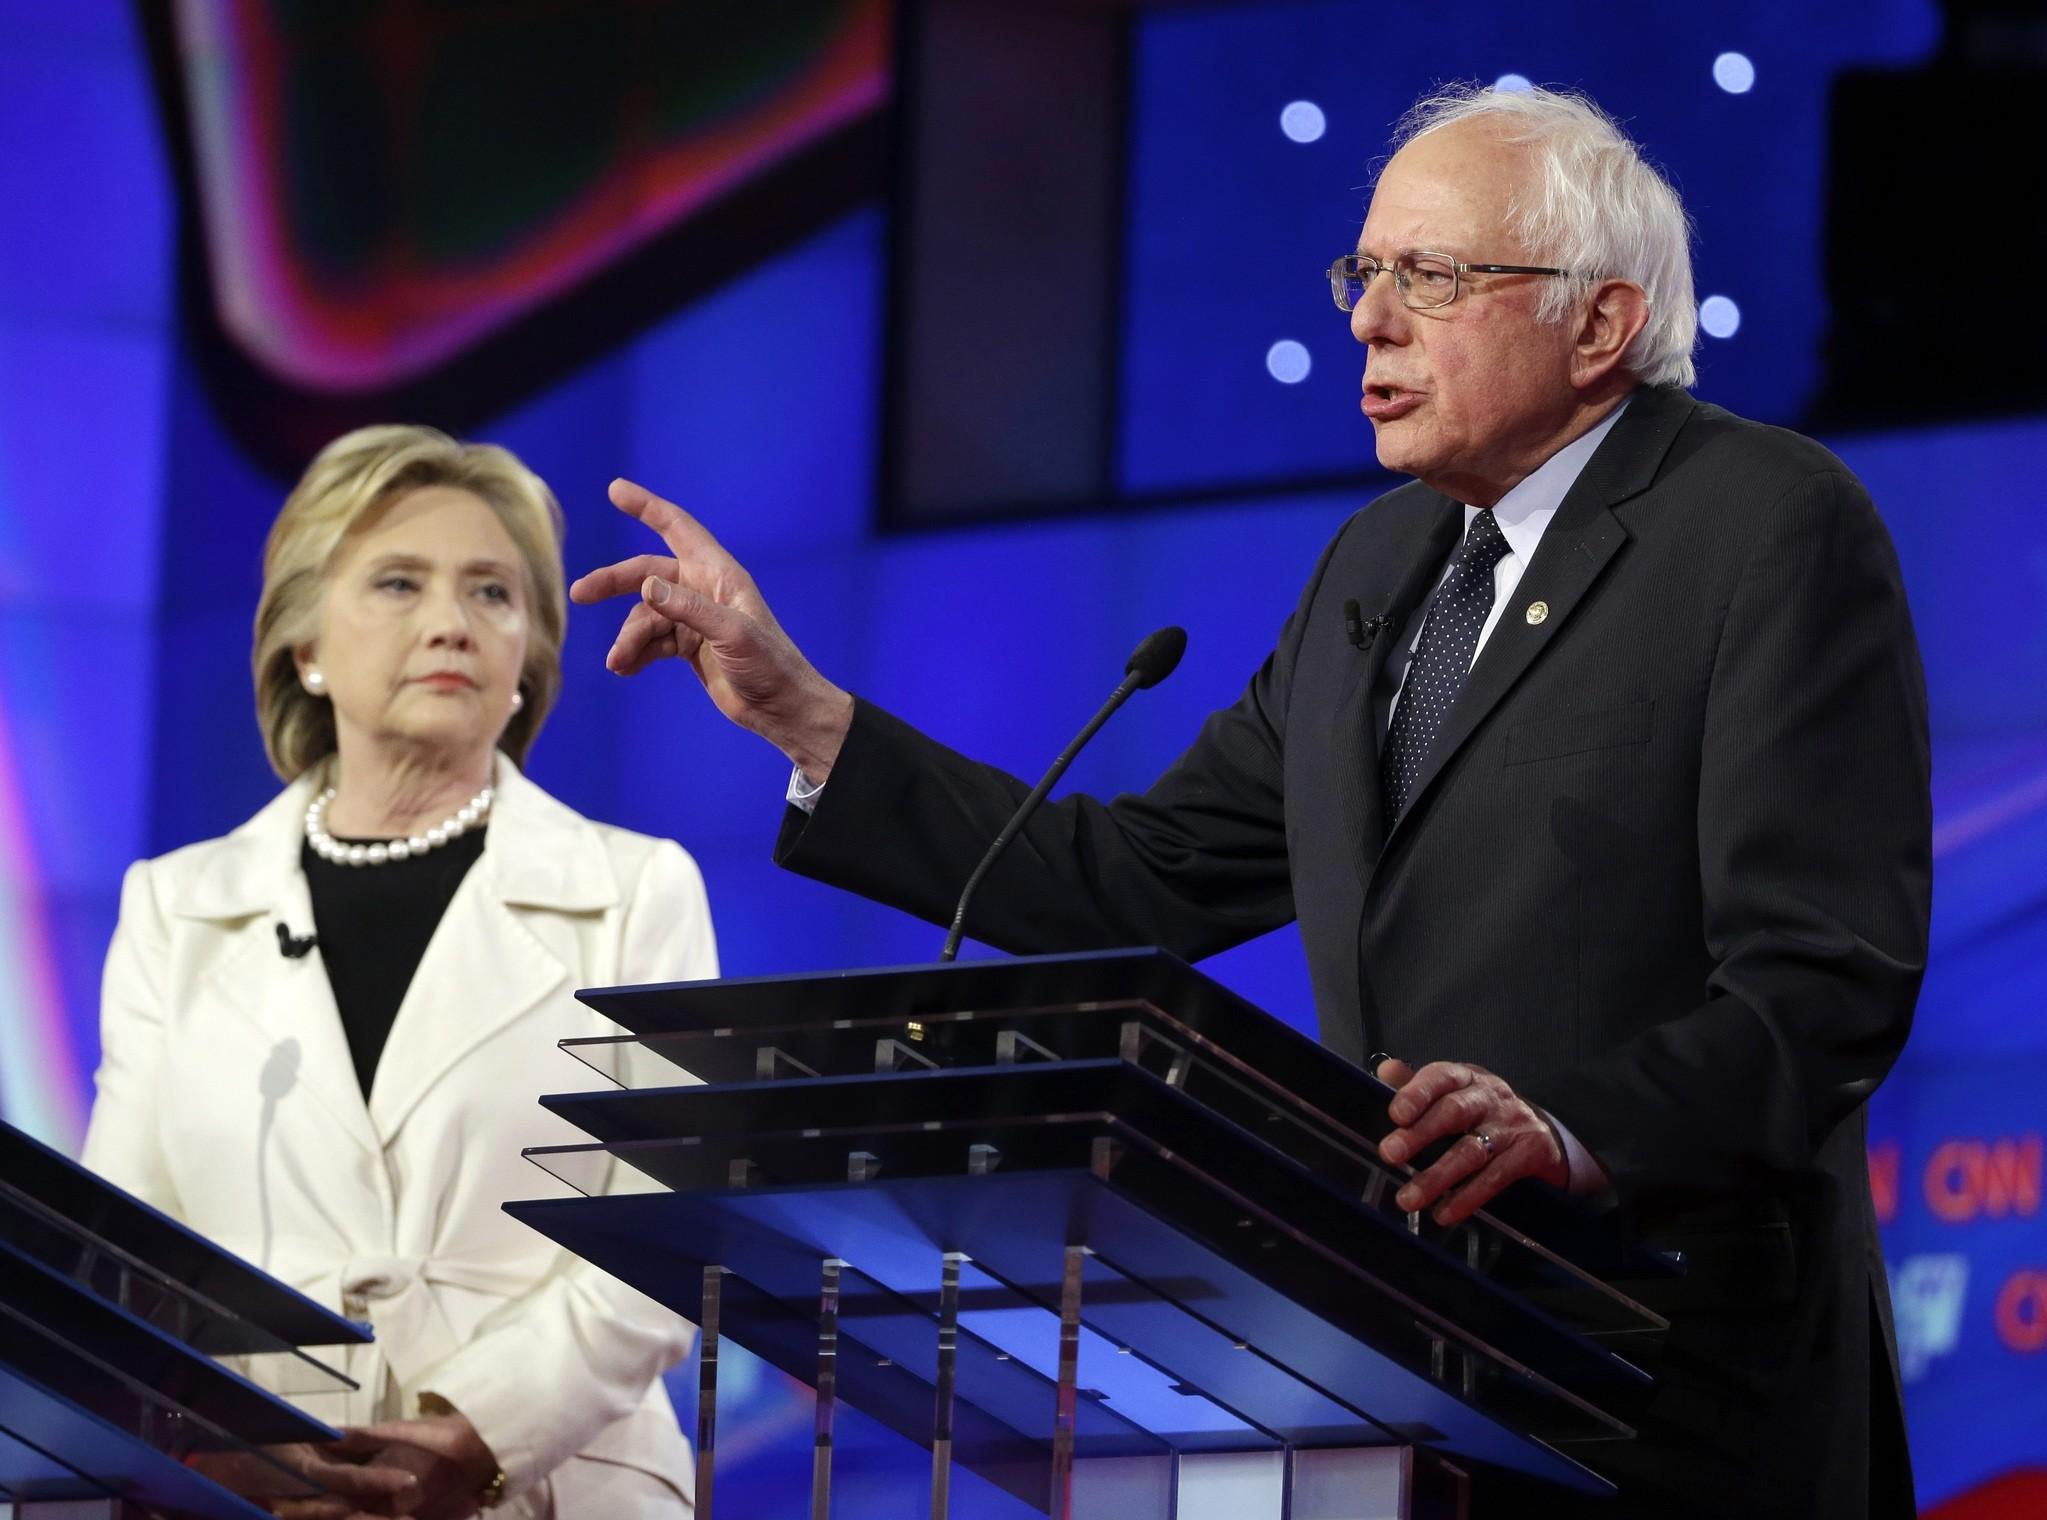 Sen. Bernie Sanders, I-V.t, right, speaks as Hillary Clinton listens during the CNN Democratic Presidential Primary Debate at the Brooklyn Navy Yard in New York. (AP Photo)